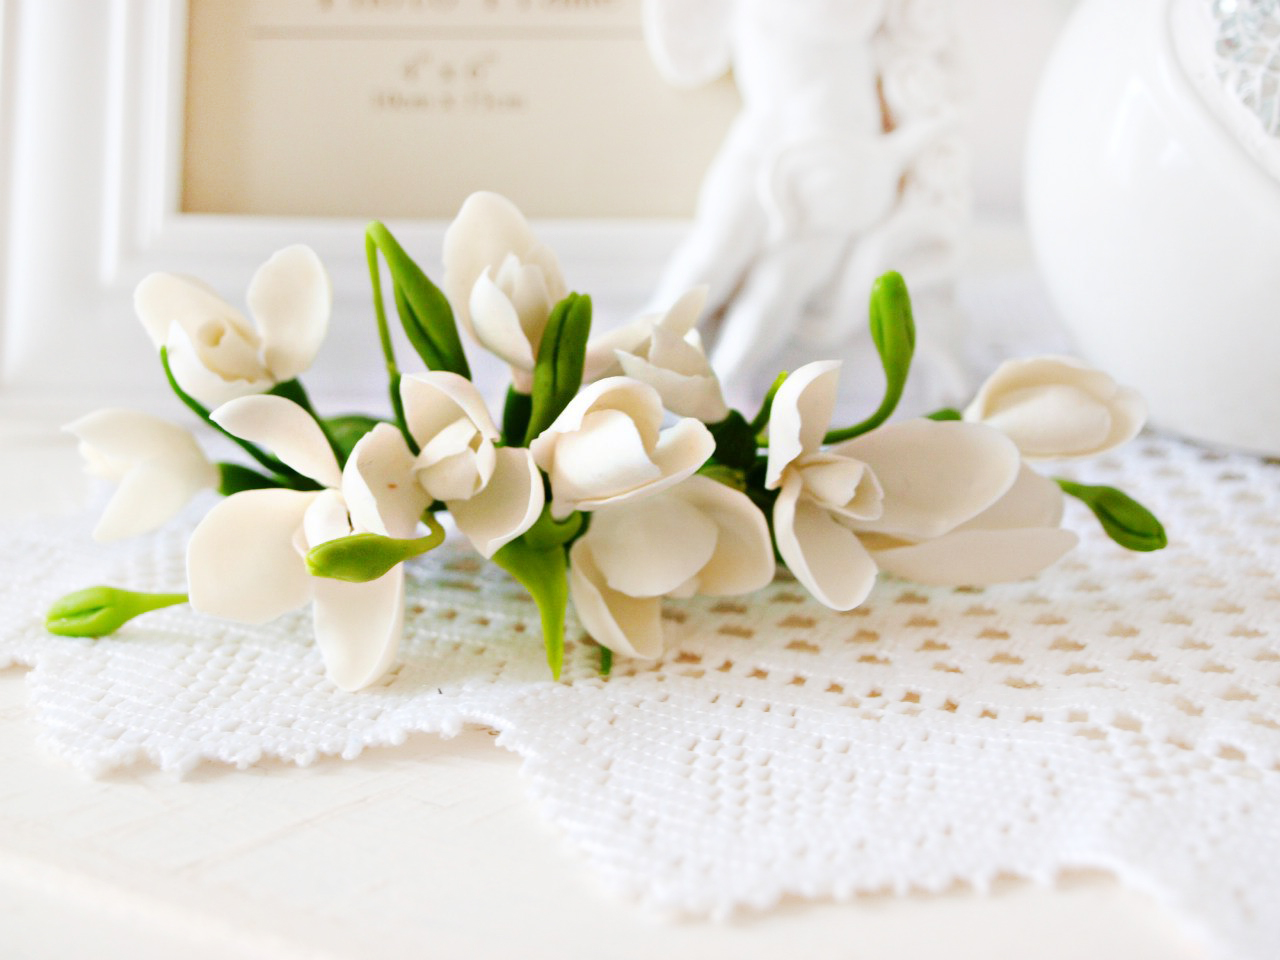 Snowdrop Hair Clip Spring Handmade Flowers Oriflowers